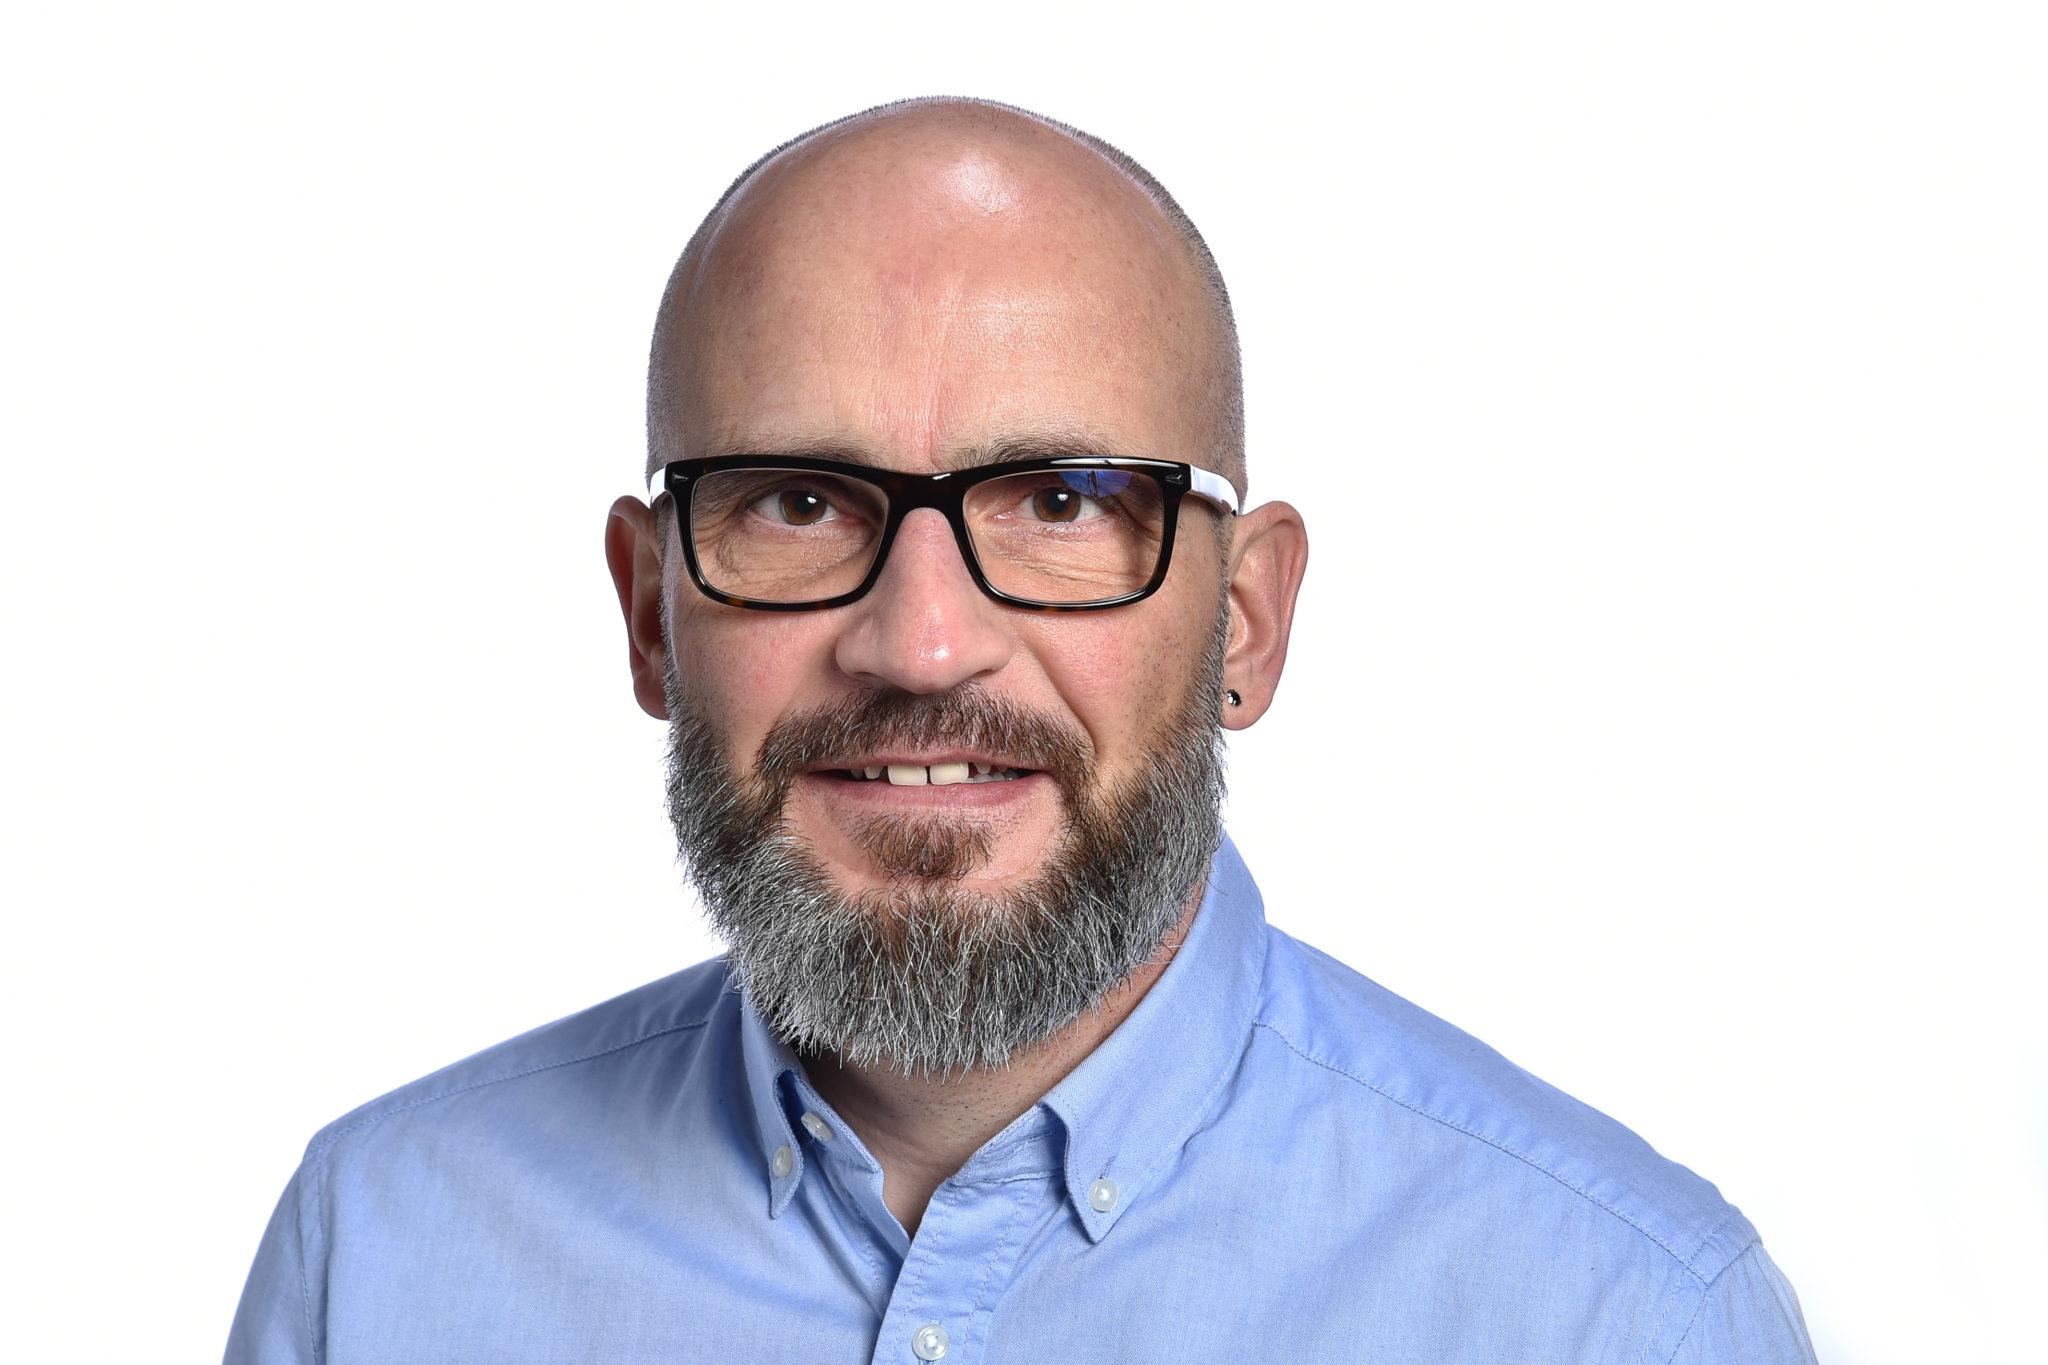 Markus Schloissnig